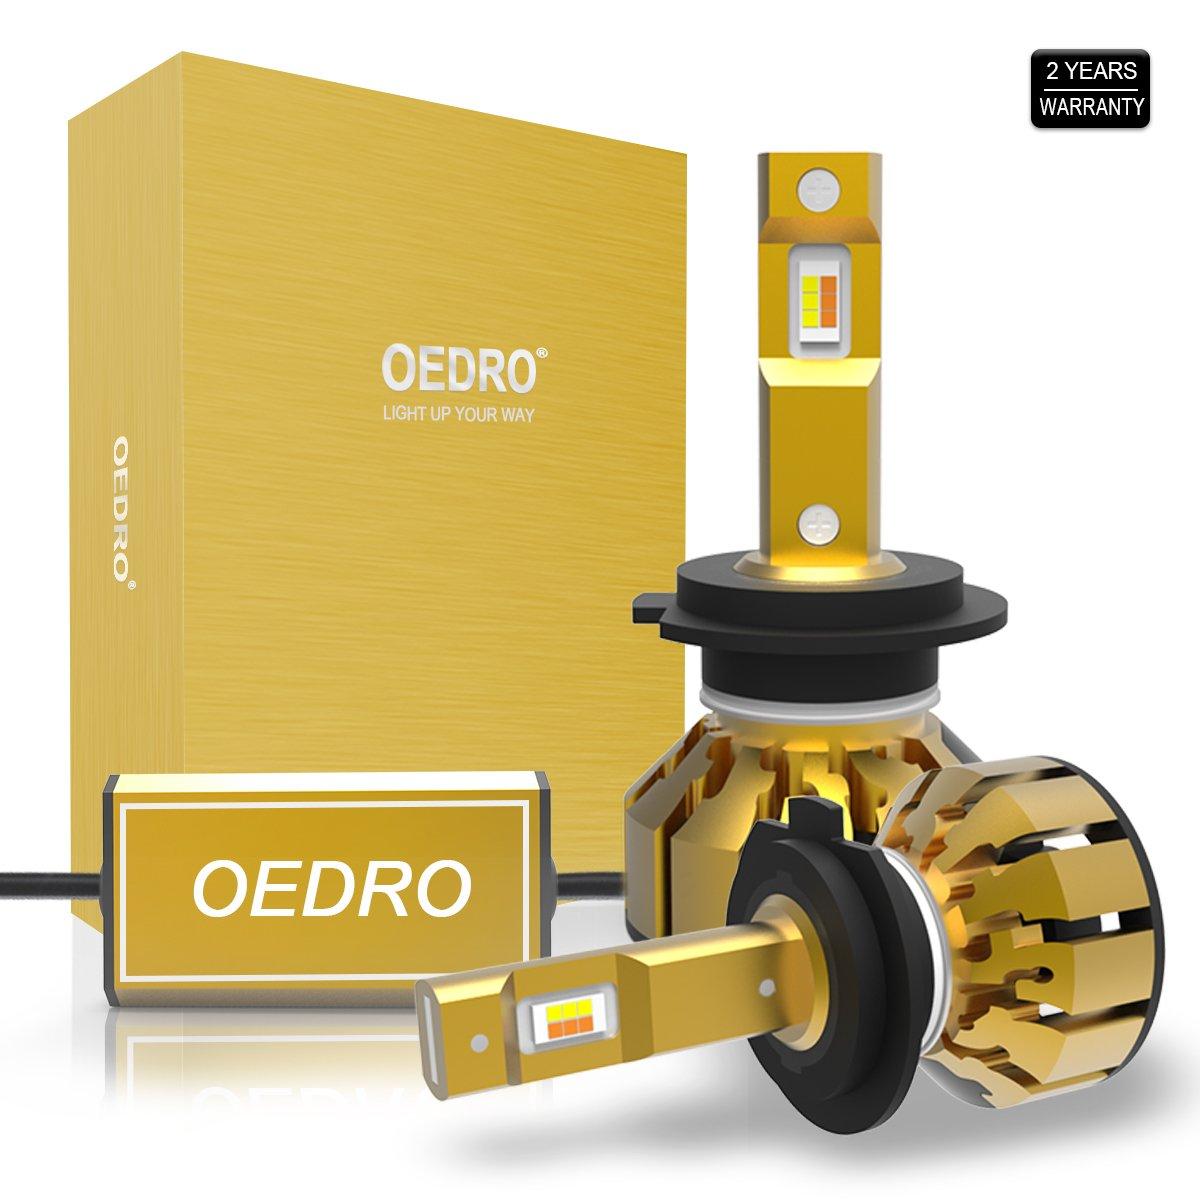 oEdRo LED Headlight Bulbs Conversion Kit Unique Triple Color LED Headlights 9006 Hb4, Upgraded Small Mini Design, Super White 6000K/Amber 3000K Dual Color Led Headlight Bright 8000 Lumens